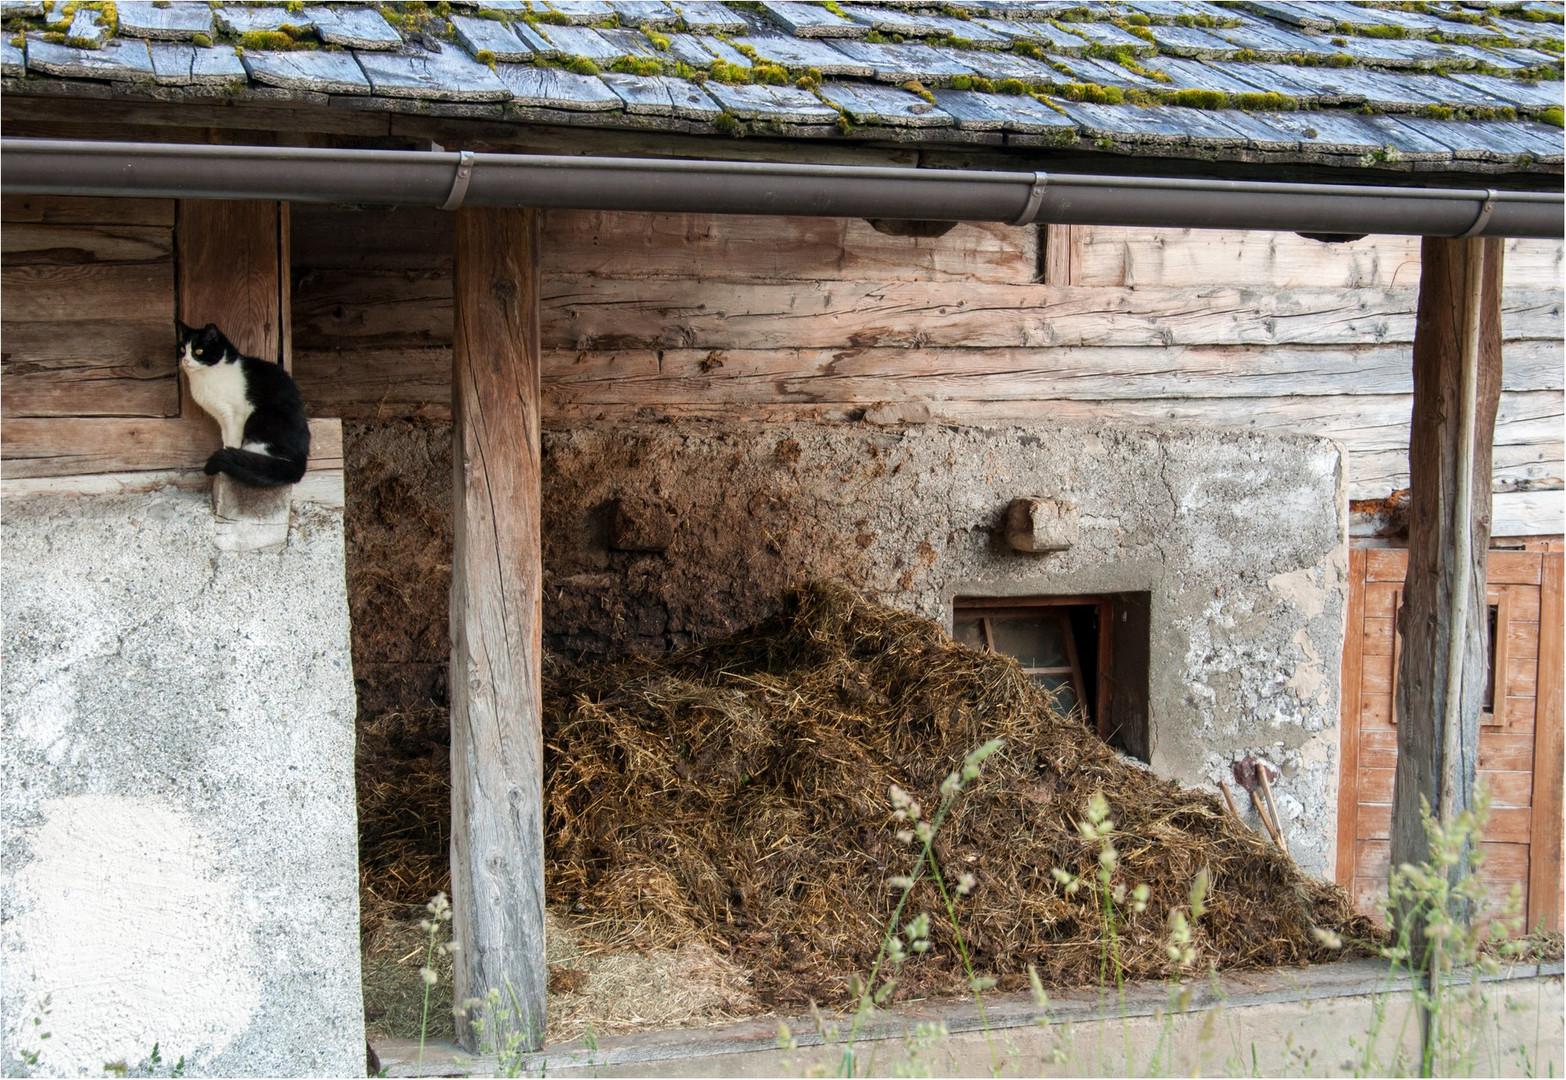 Die Katze neben dem Misthaufen Foto & Bild | natur, katzen, tiere ...